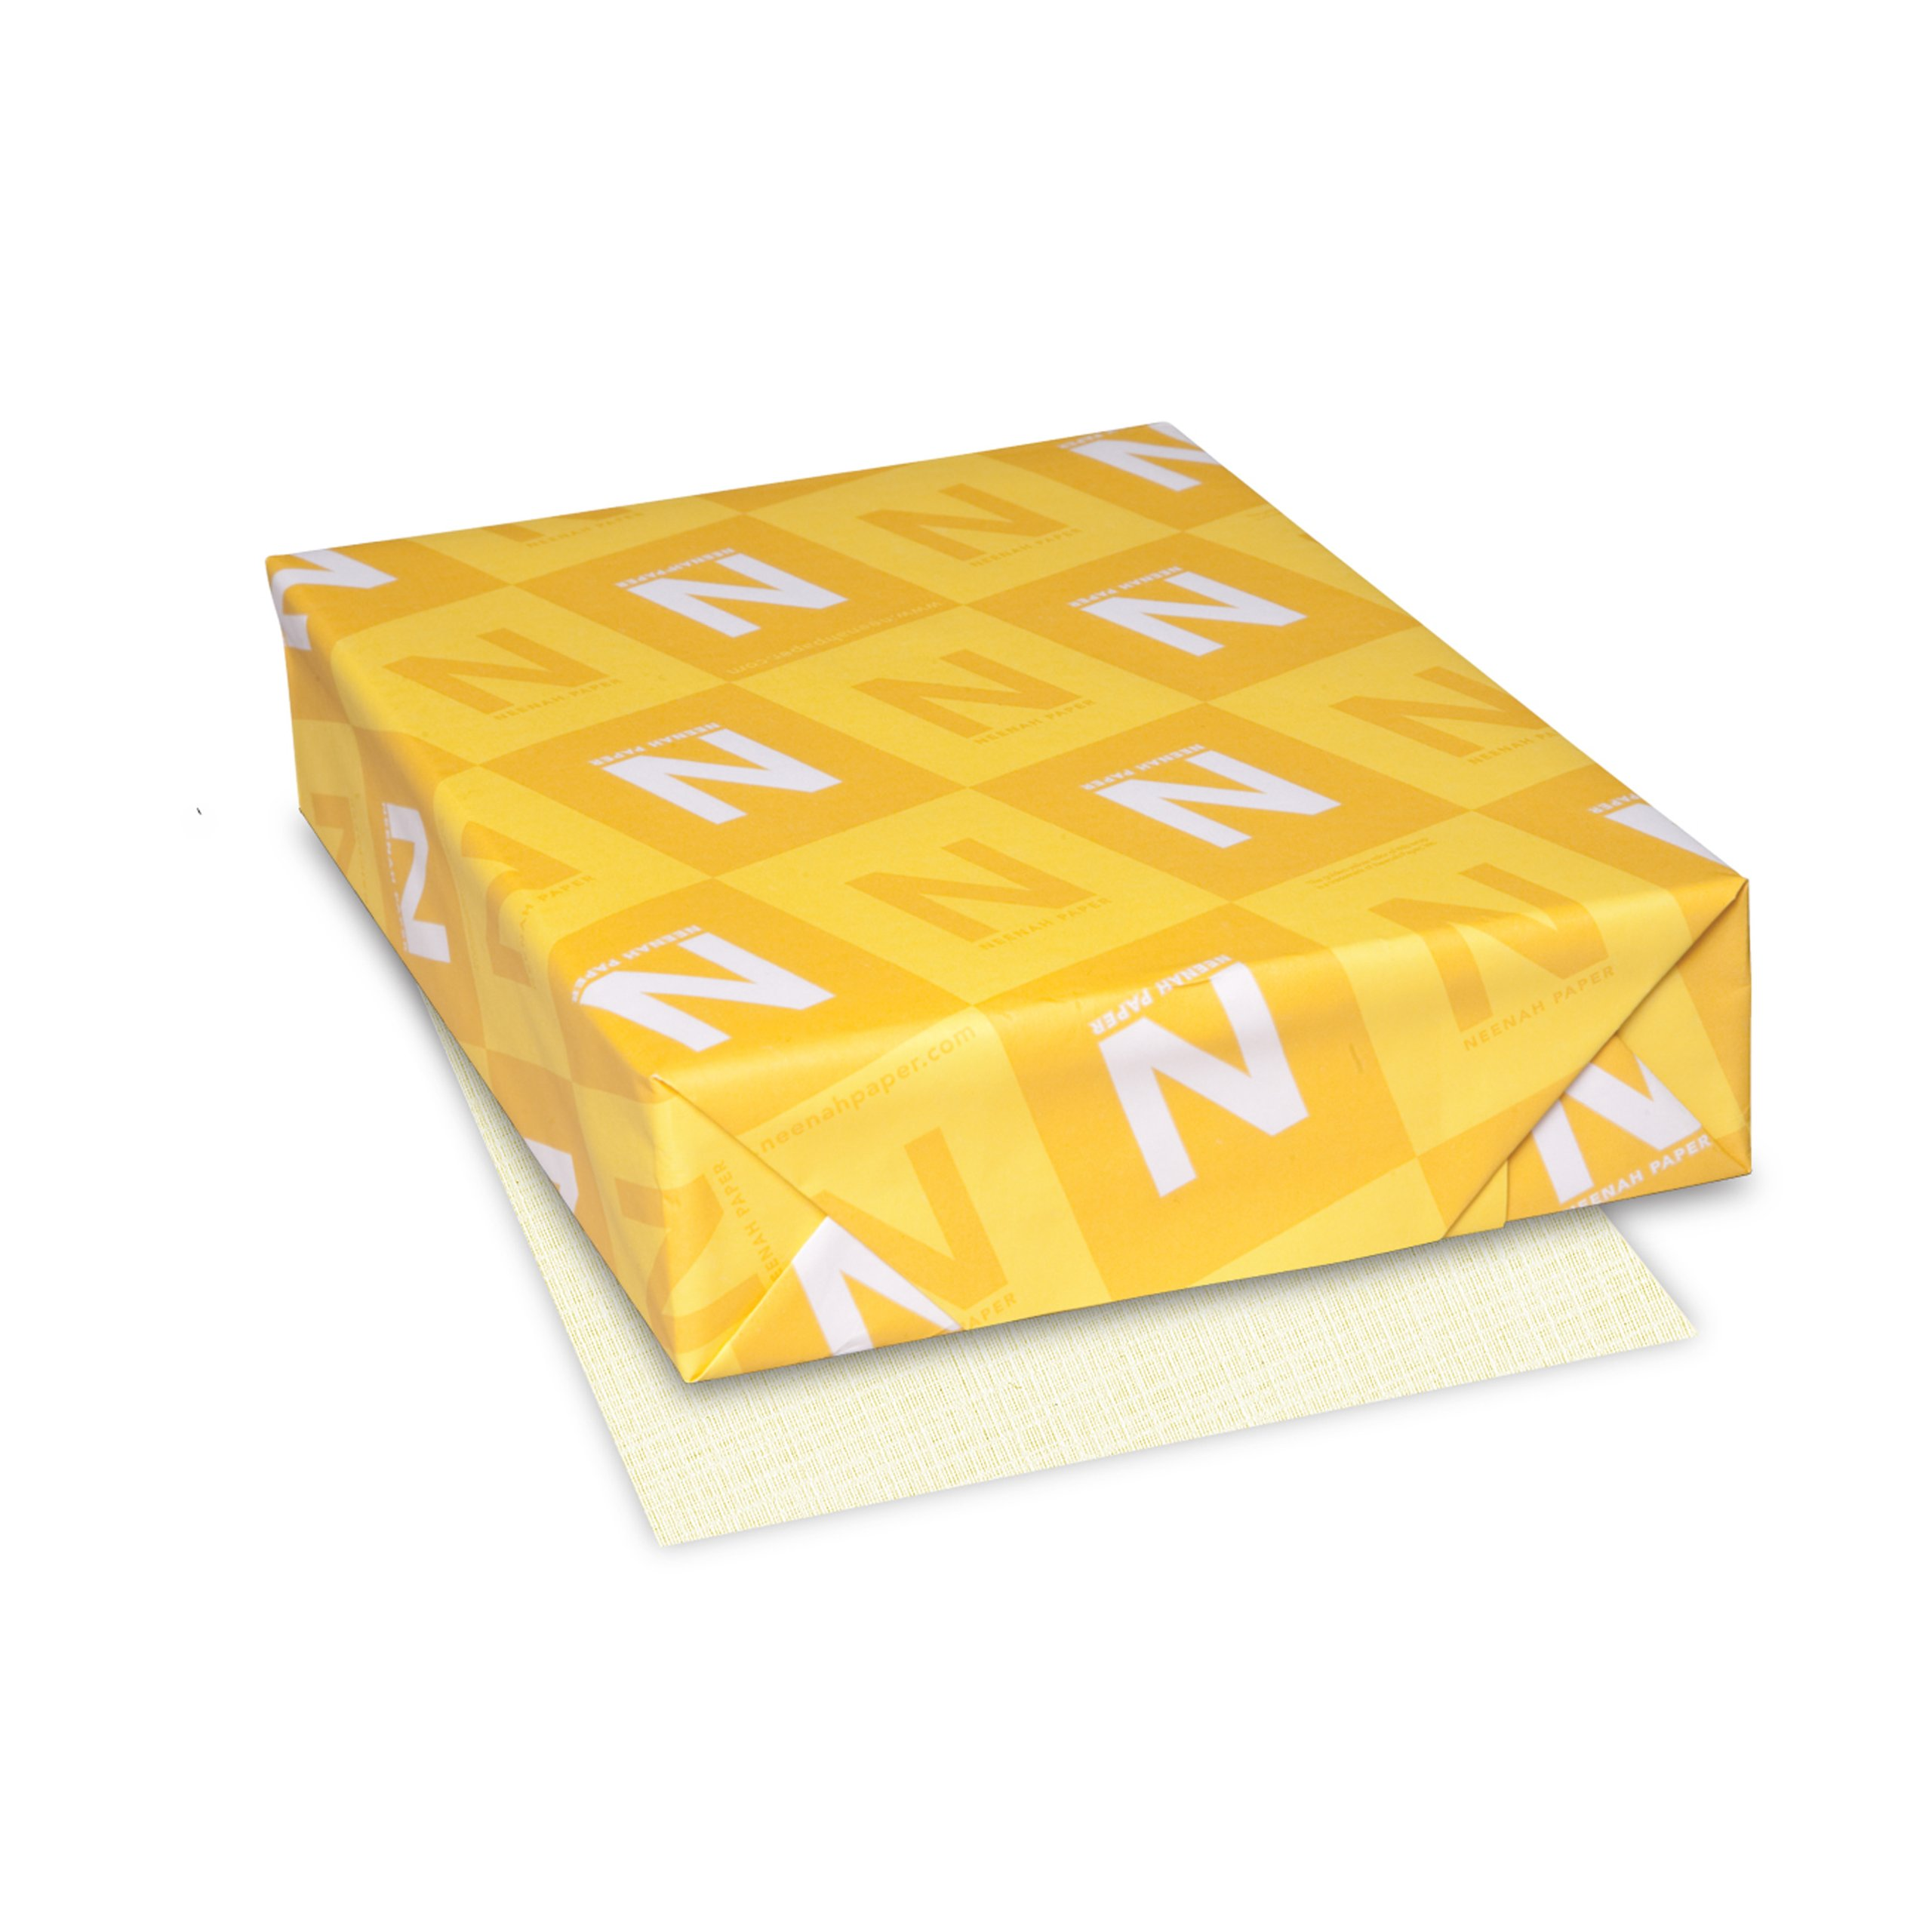 Classic Linen Premium Paper, 8.5'' x 11'', 24 lb, Baronial Ivory, 500 Sheets (05221)